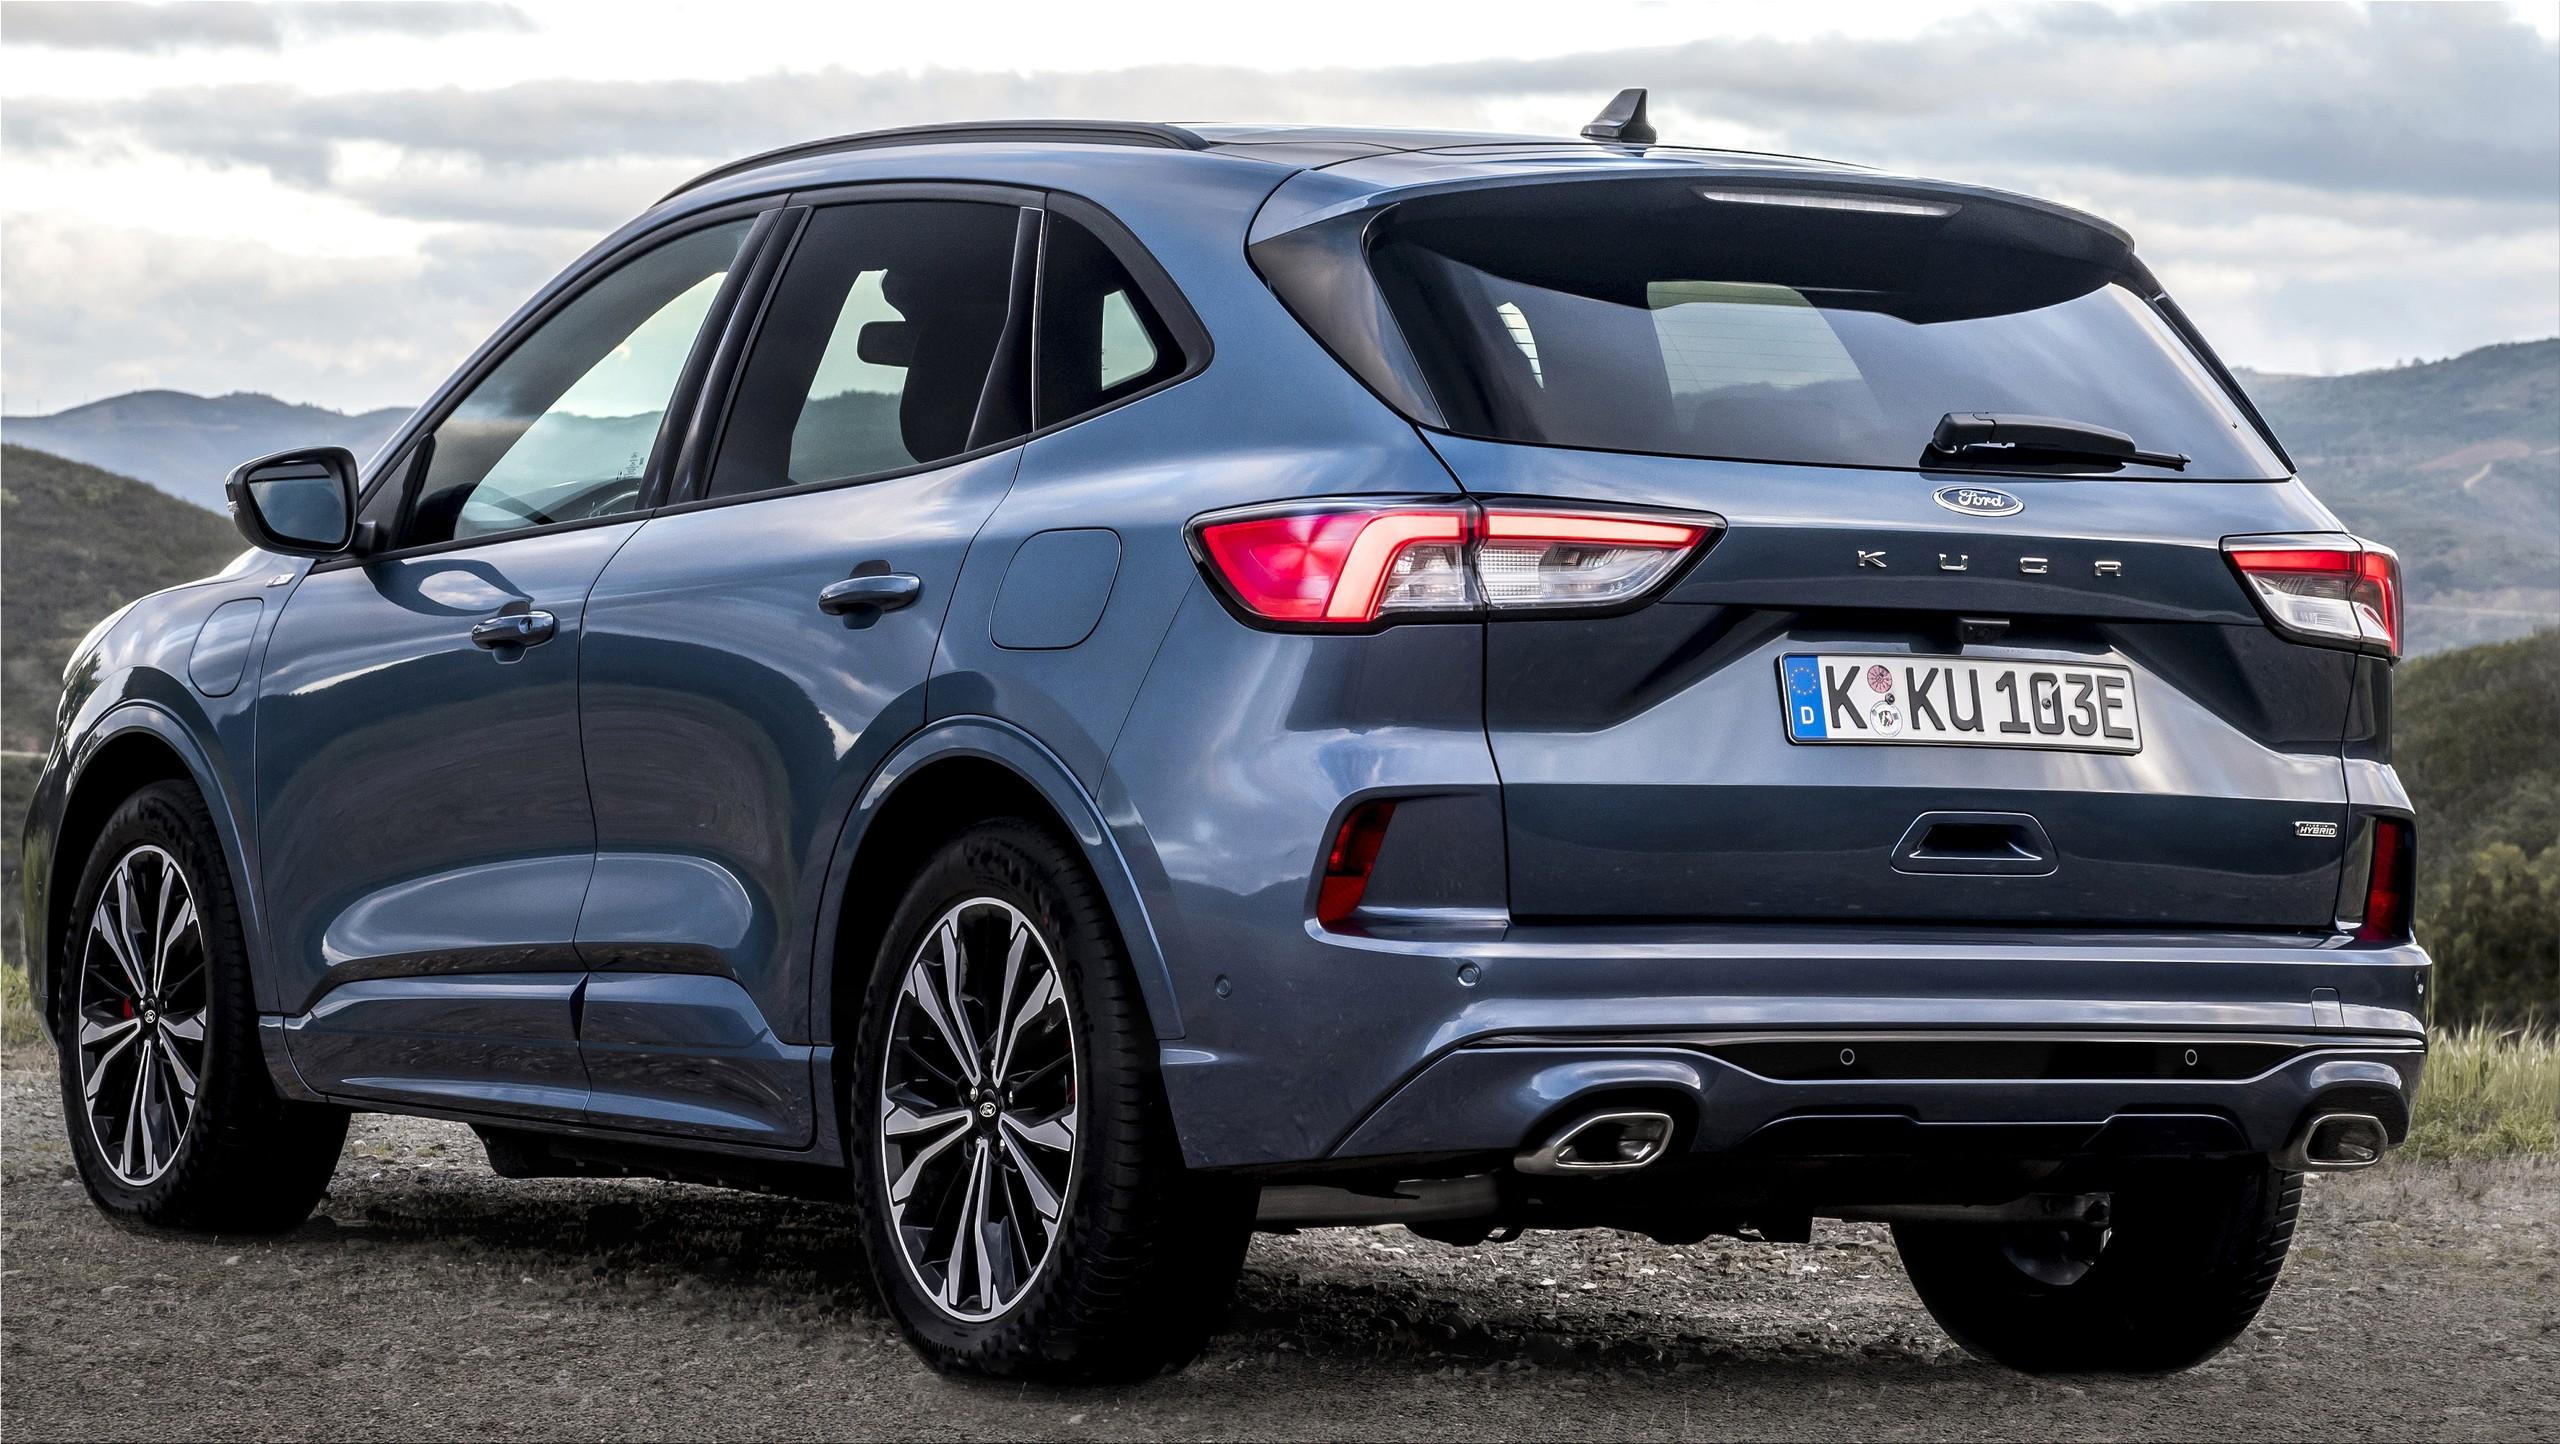 La nueva Ford Kuga 2021 Titanium Hibrida